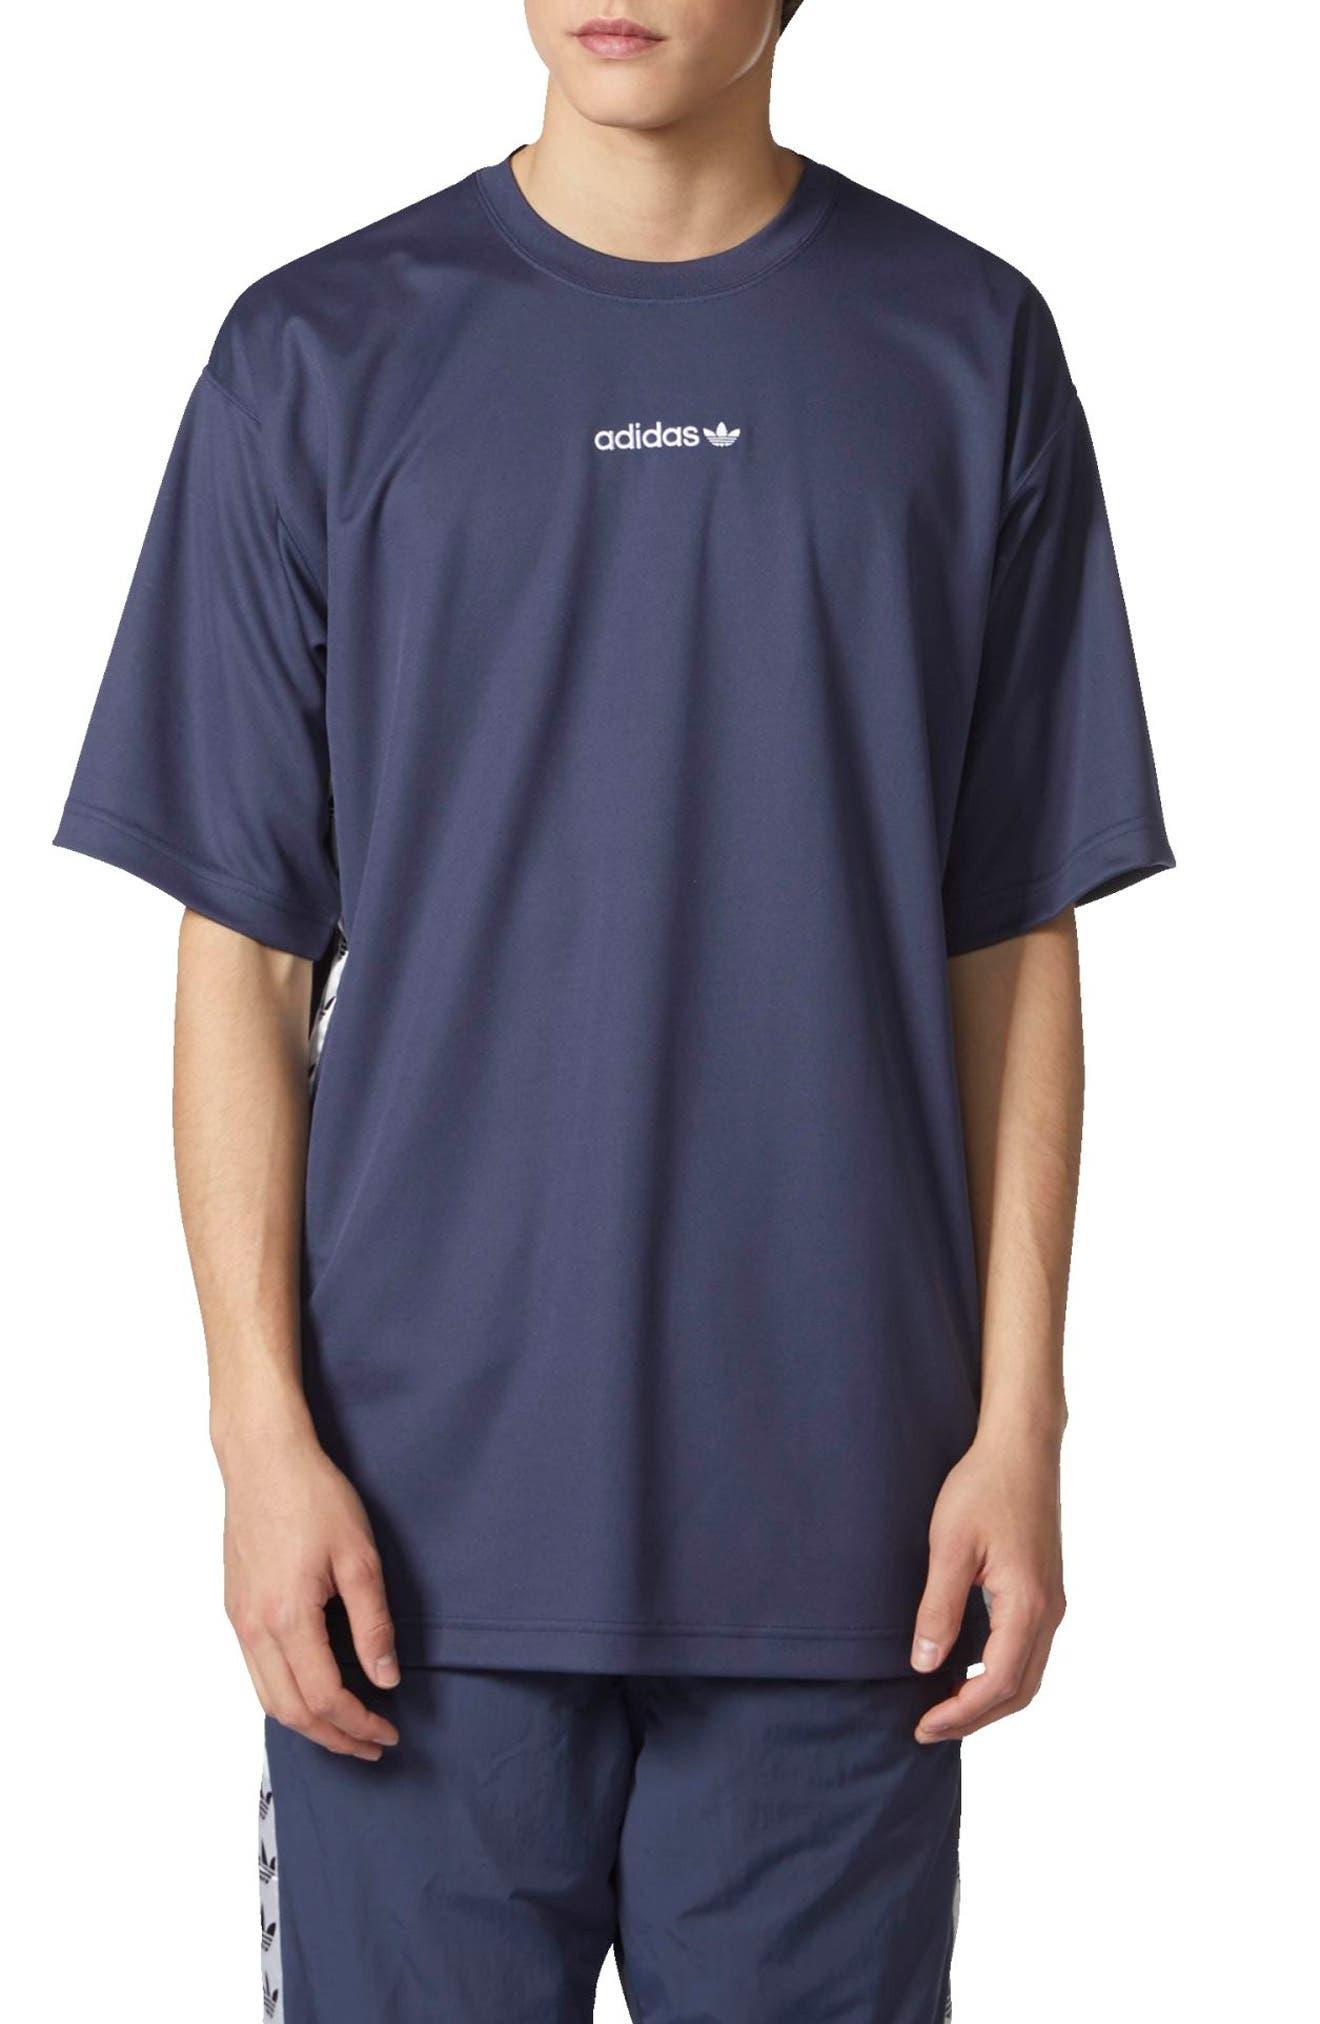 adidas Originals TNT Tape T-Shirt